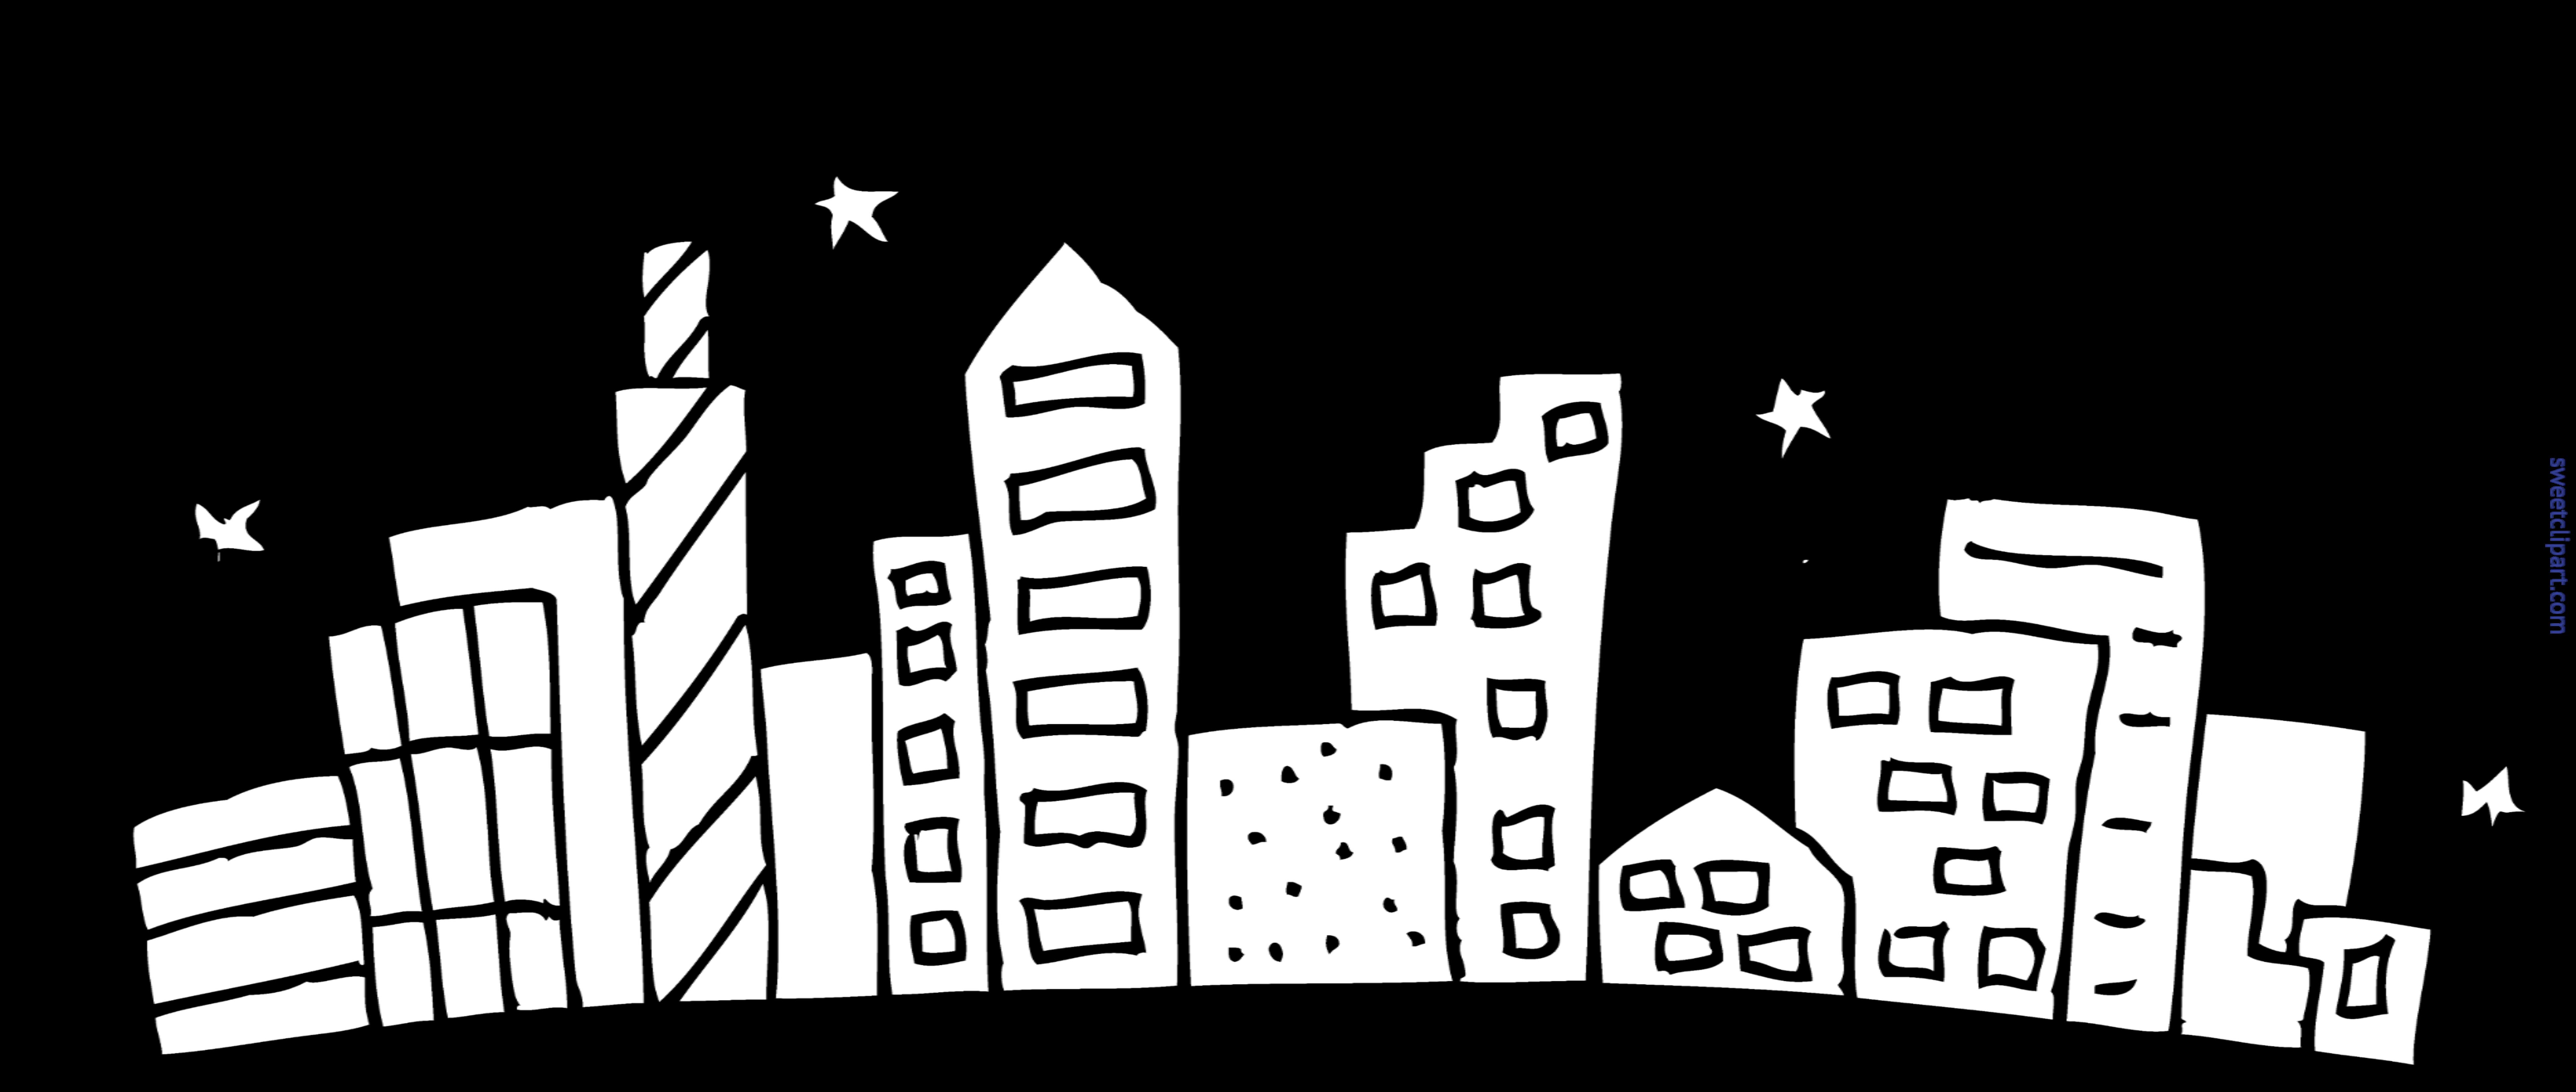 7779x3298 Cityscape Coloring Page Clip Art